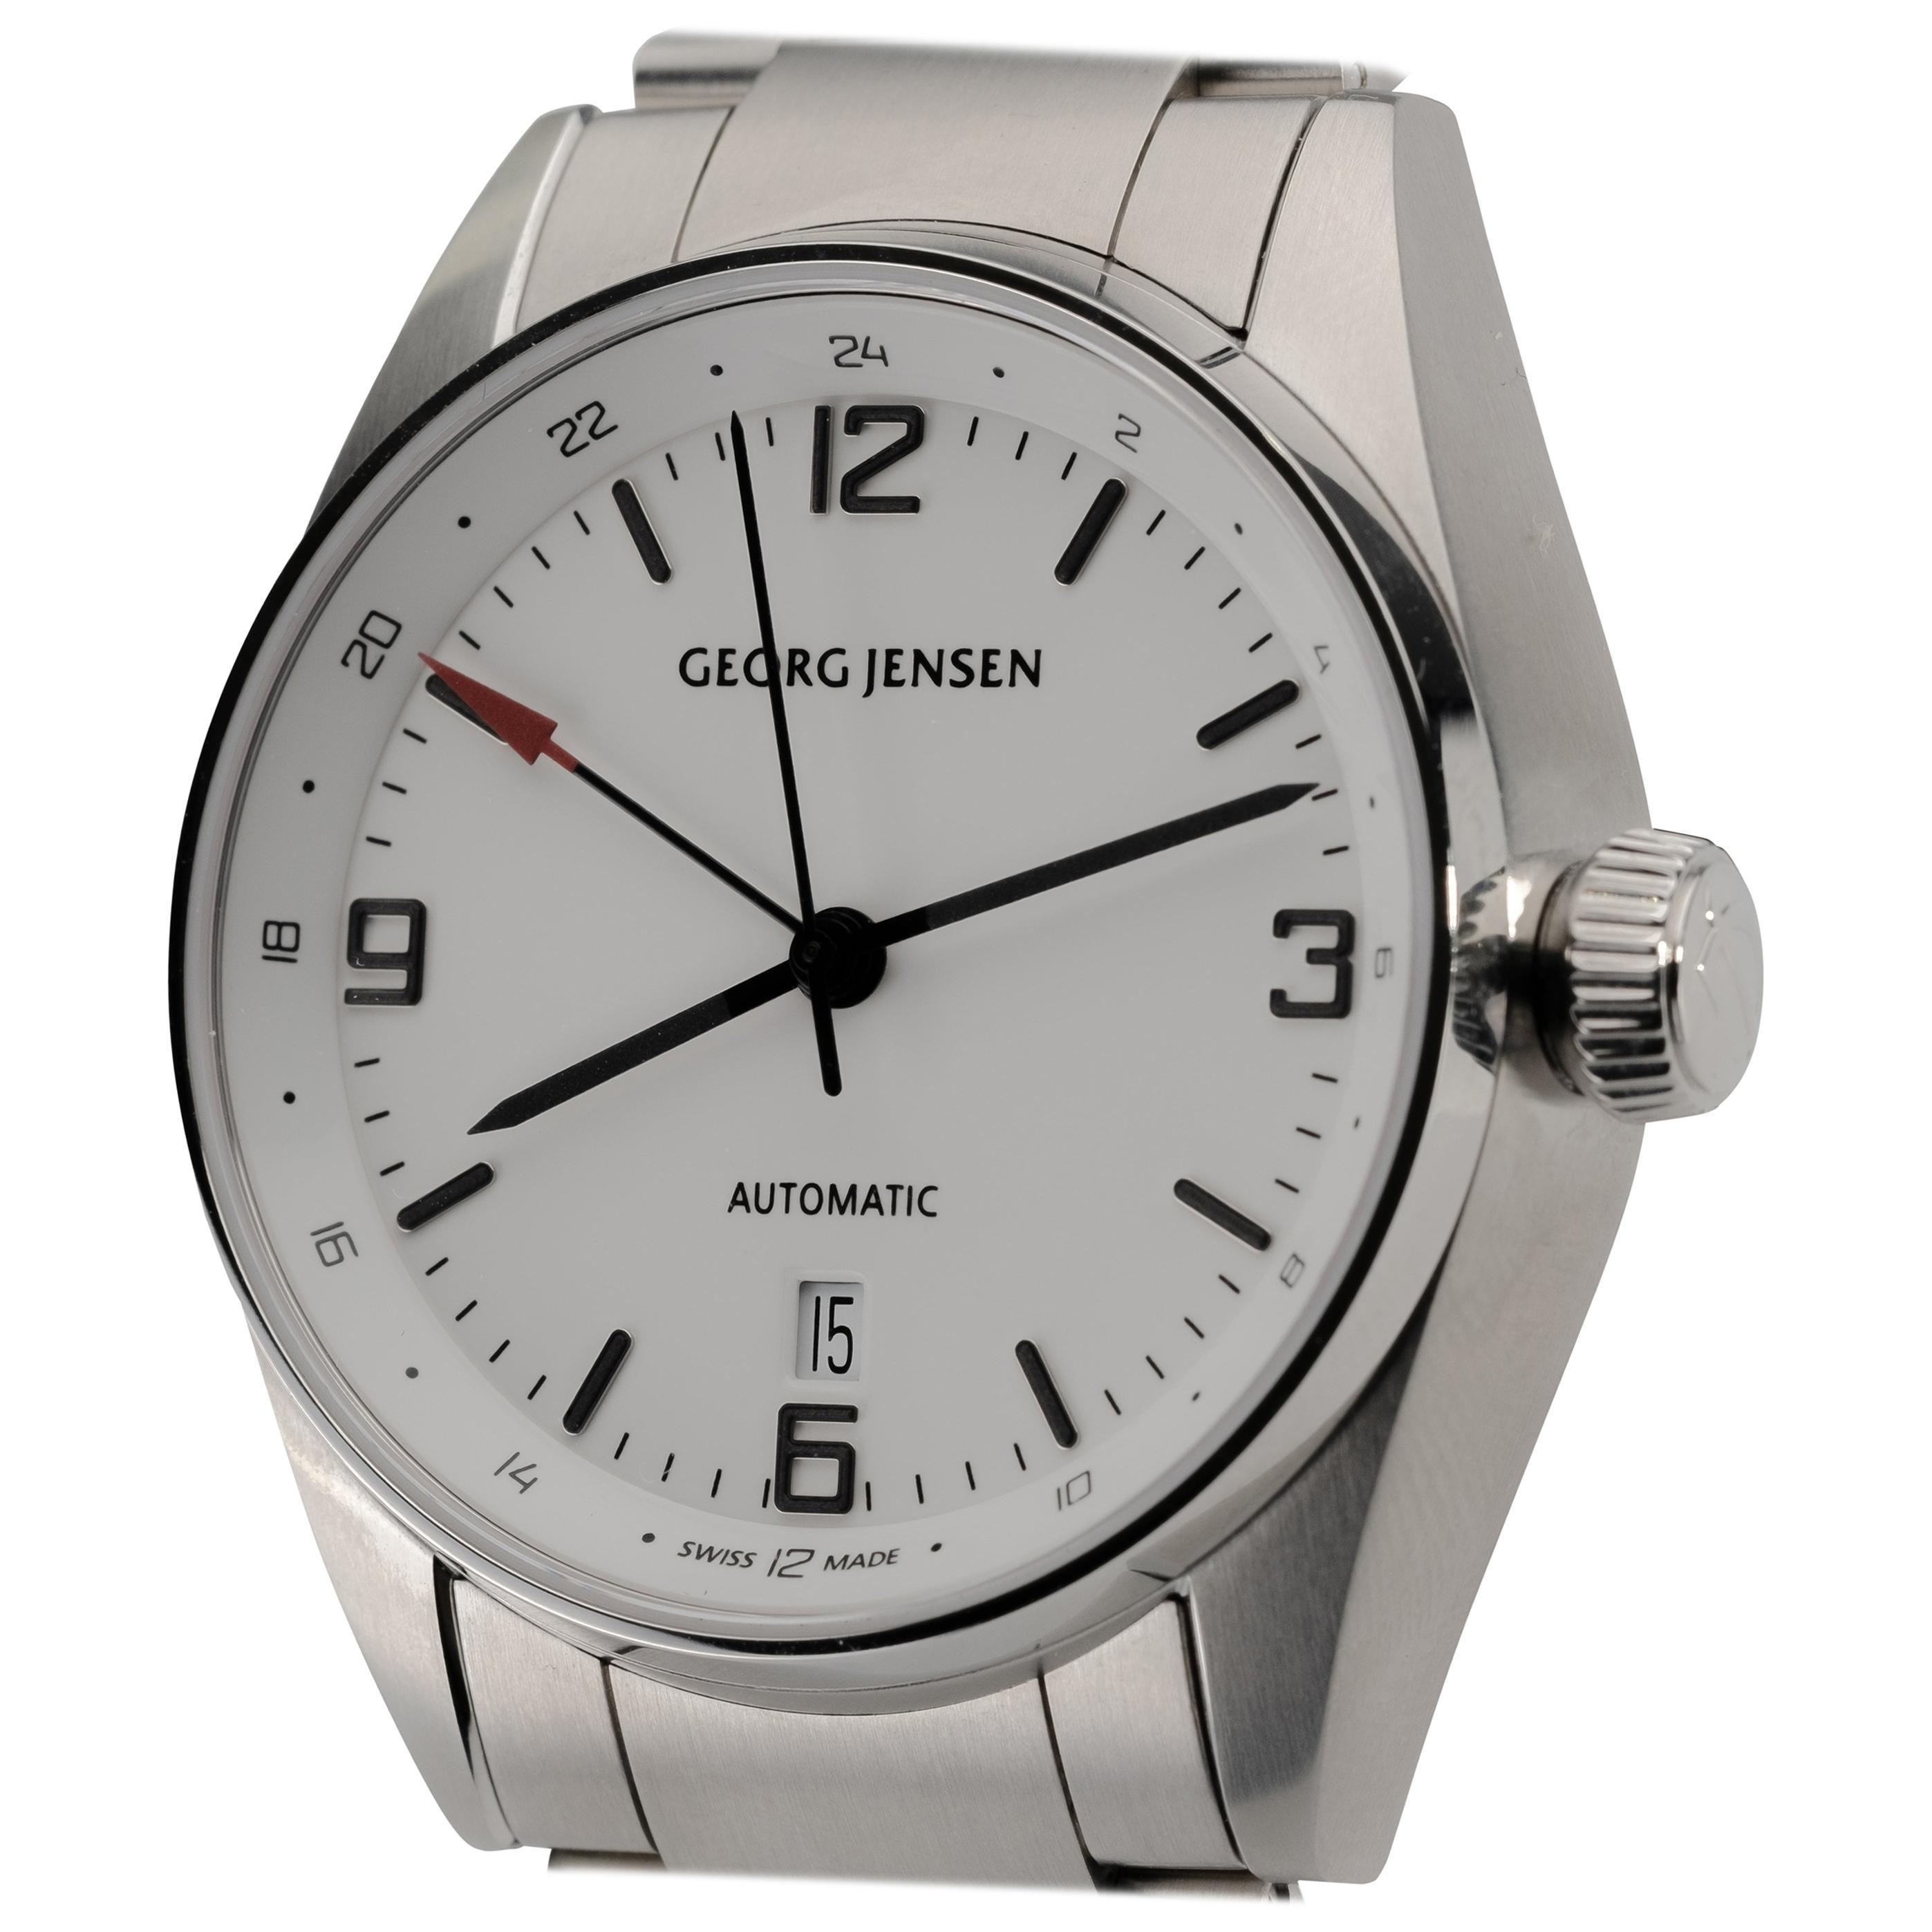 Georg Jensen Stainless Steel Automatic Watch